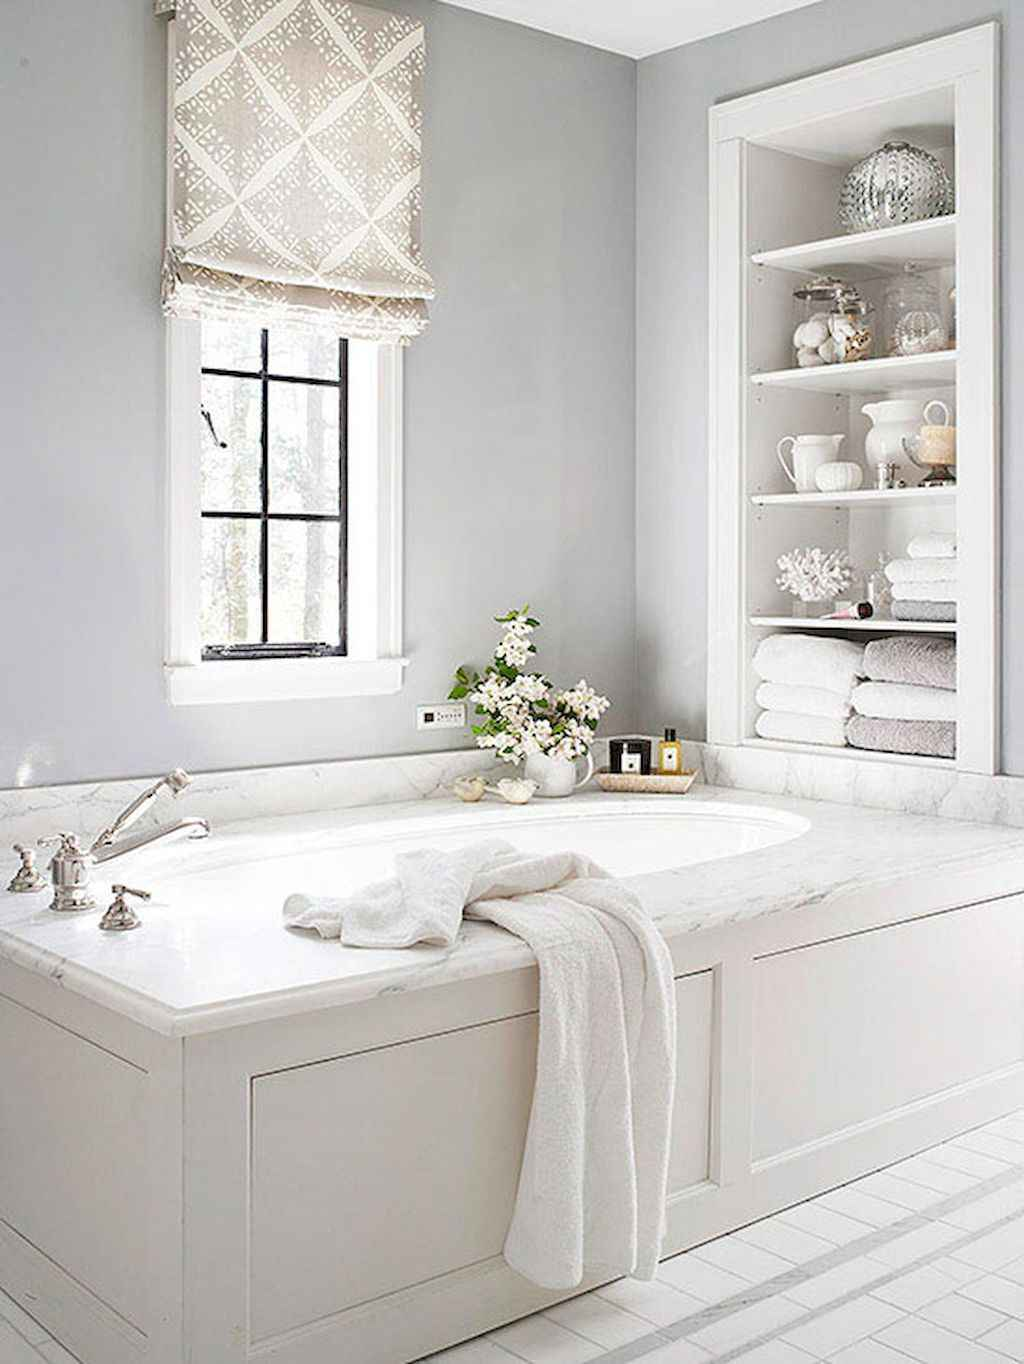 Cool bathroom storage shelves organization ideas (18)